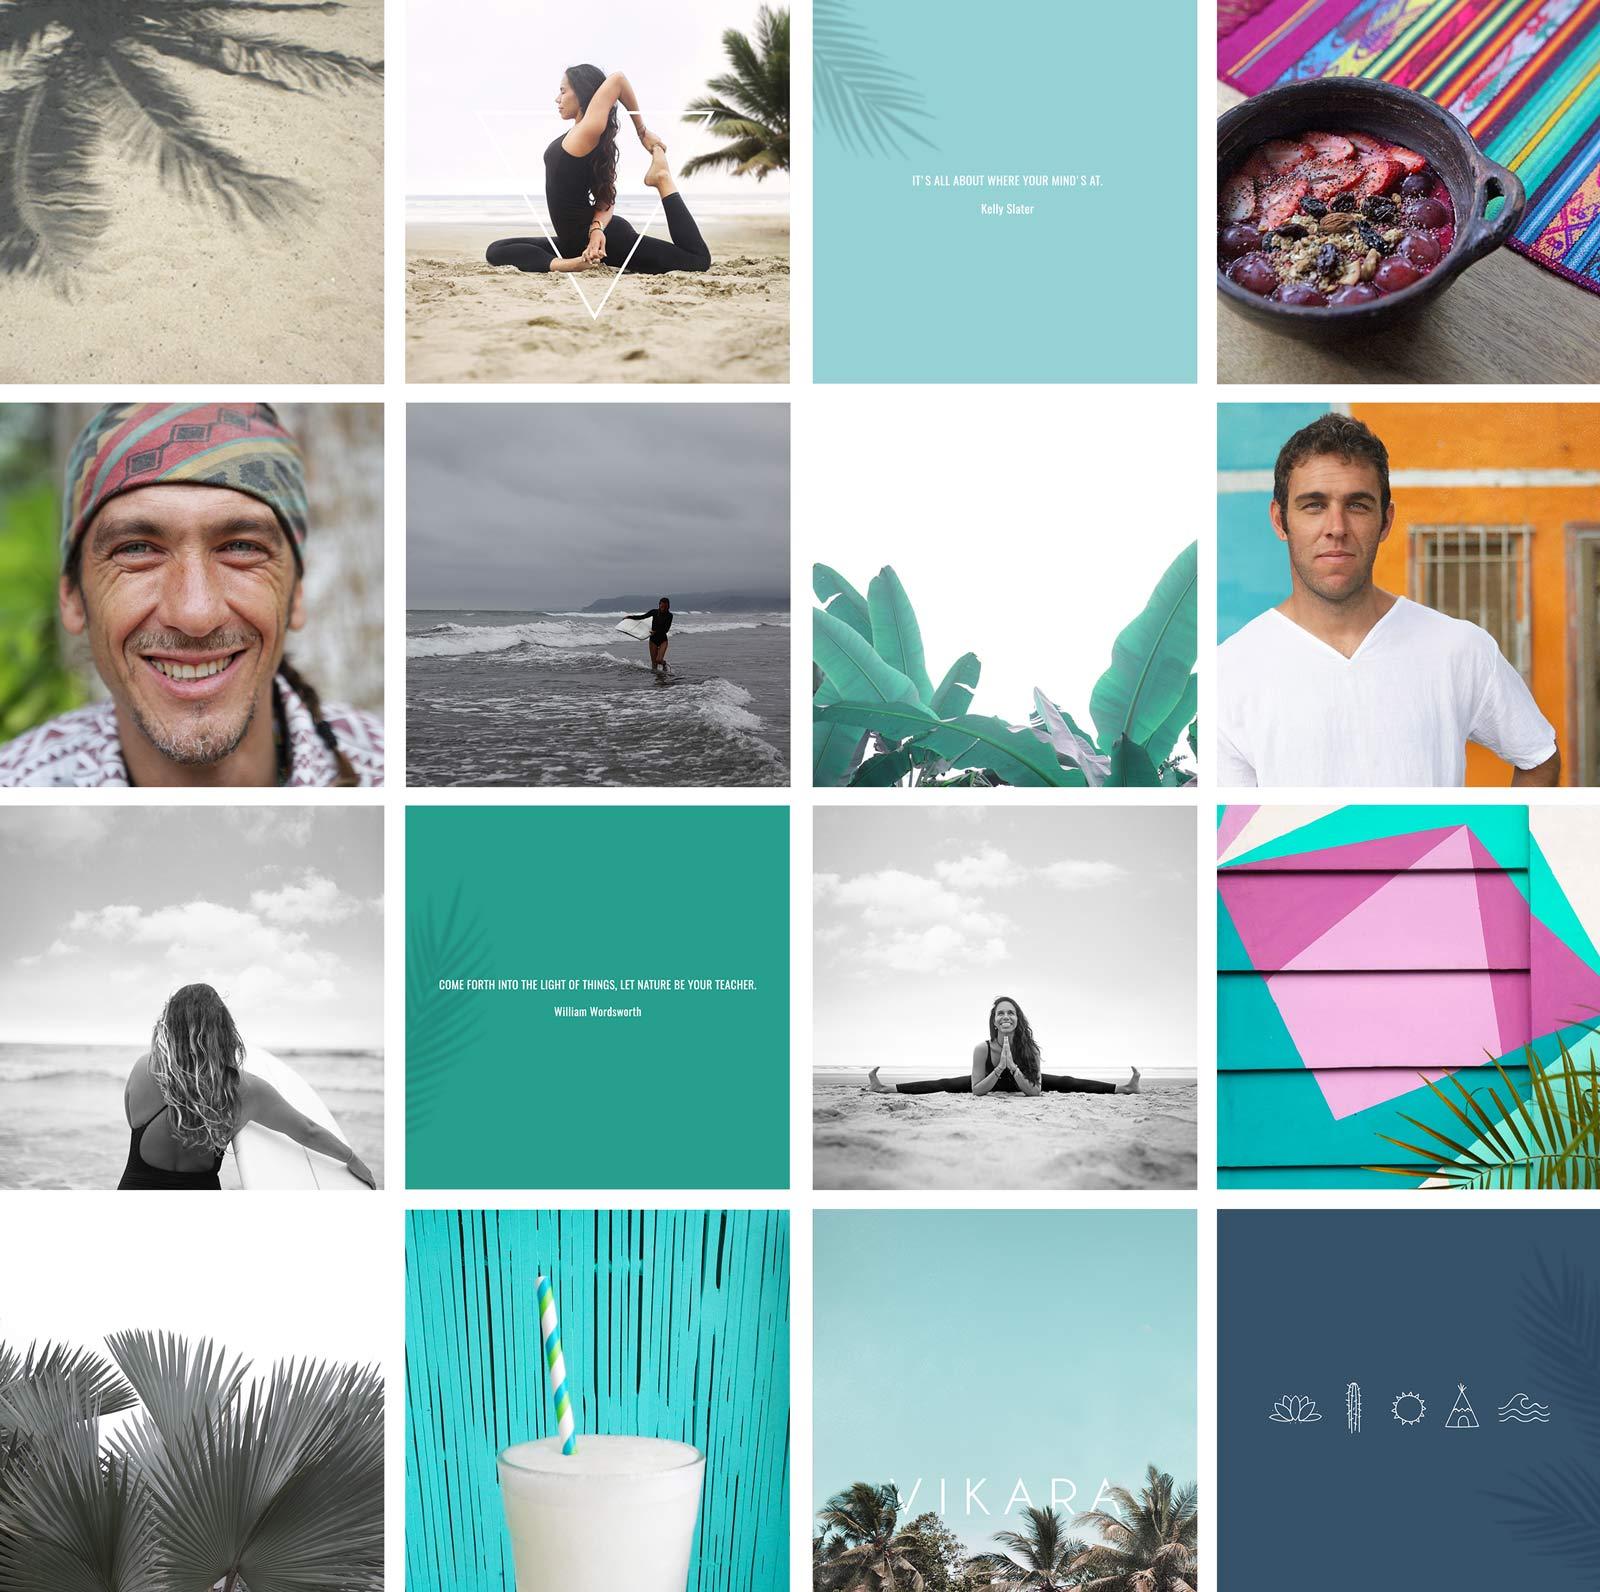 Shooting photo Vikara - Yoga & Surf